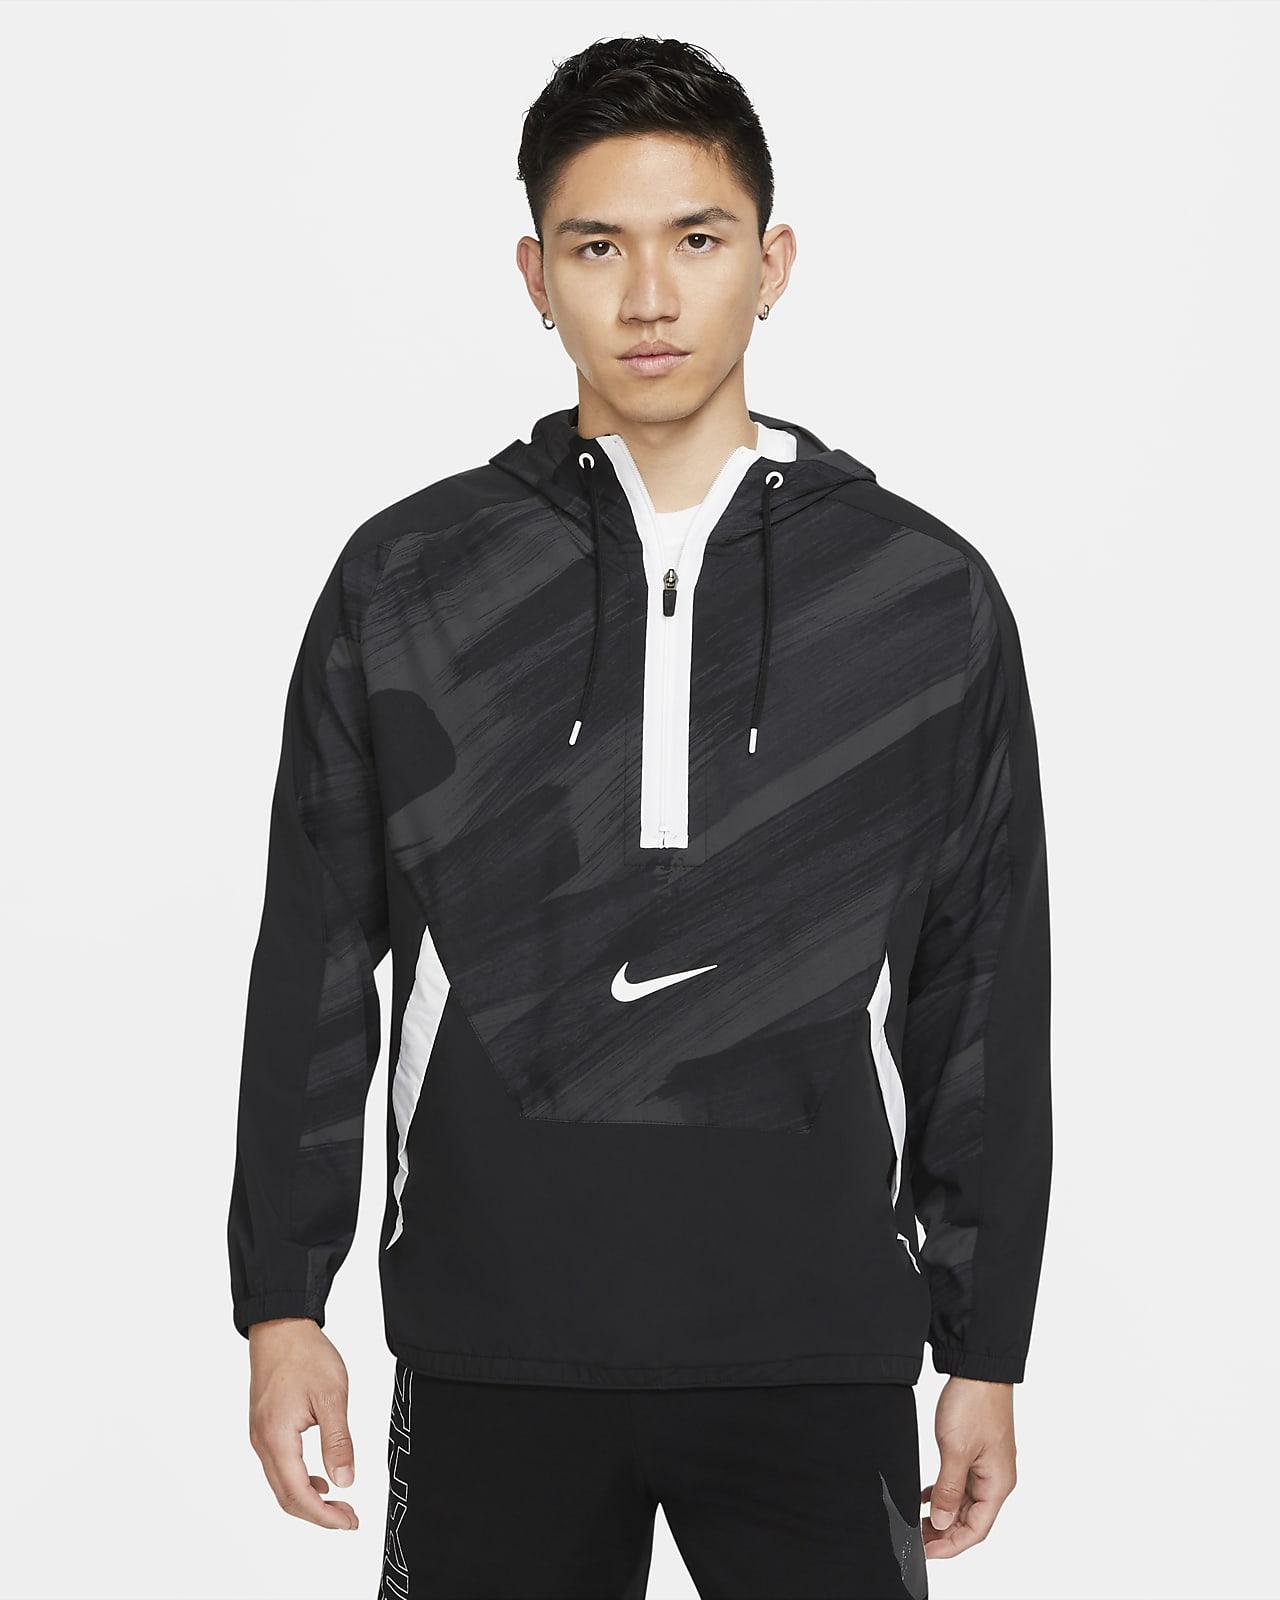 Nike Dri-FIT Sport Clash Men's Woven 1/2-Zip Training Hoodie